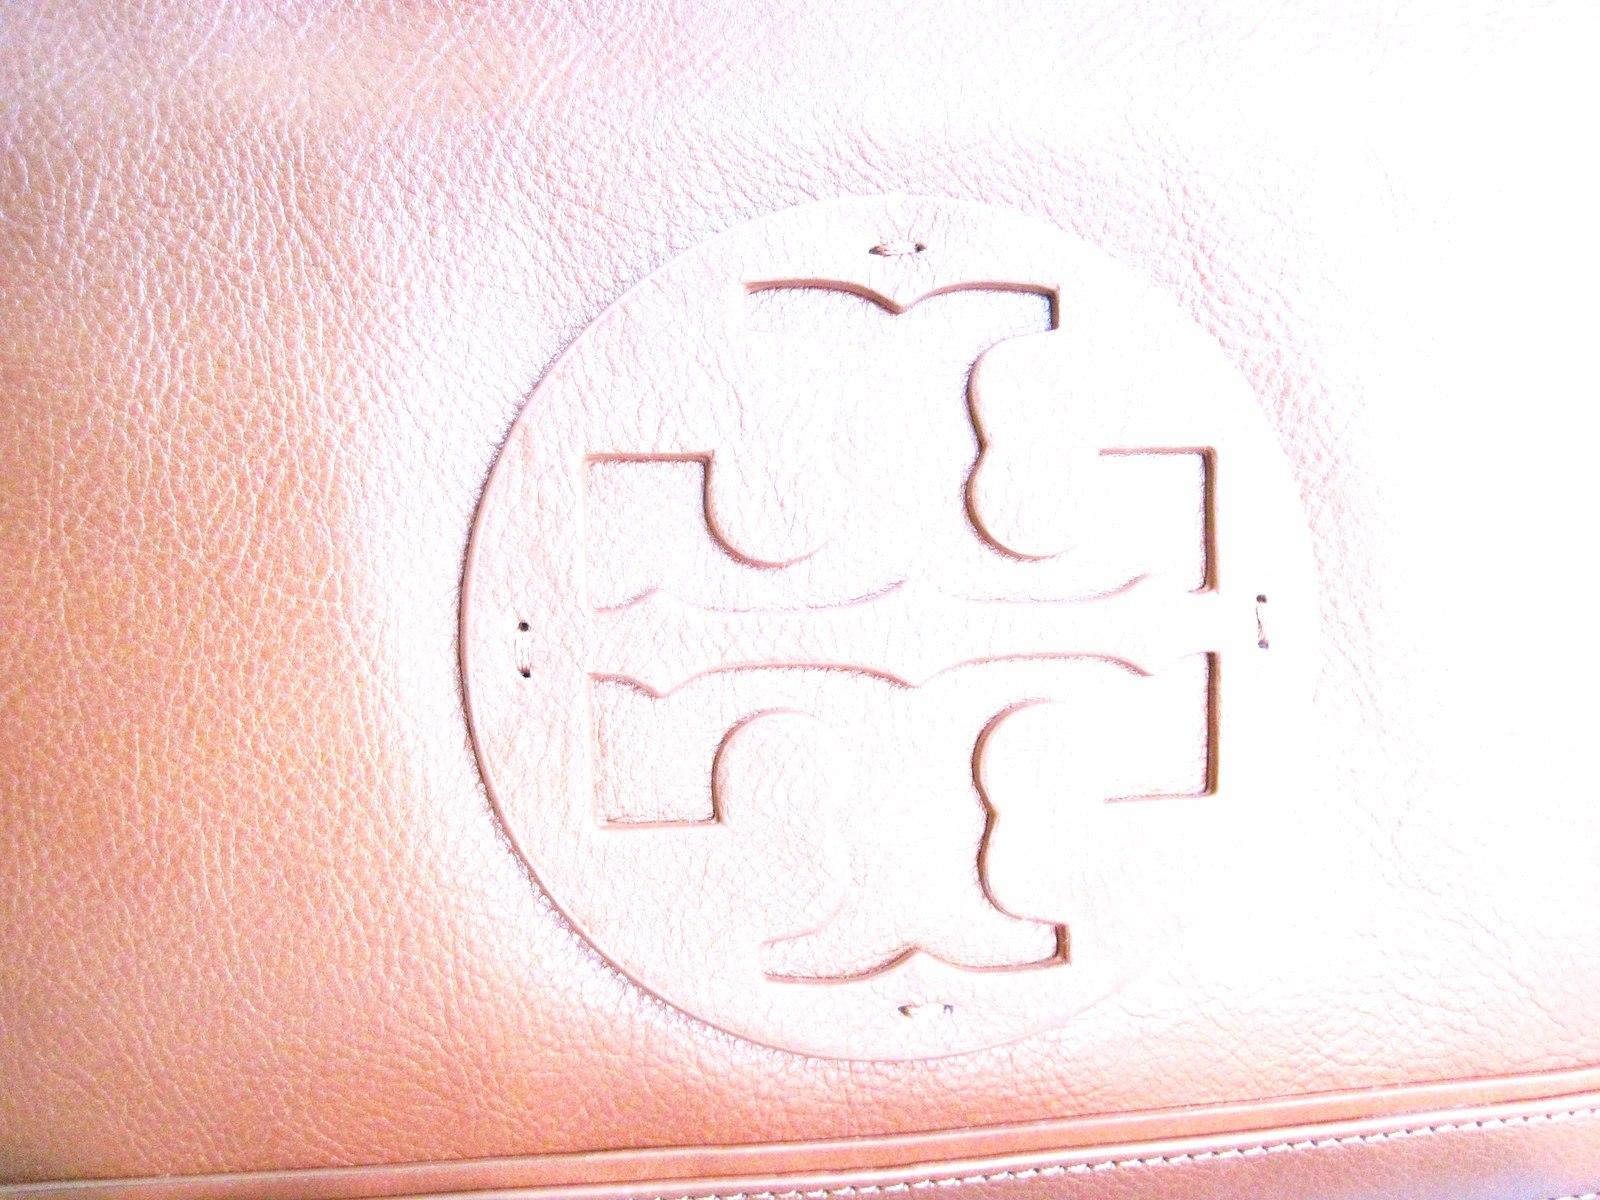 Tory Burch SUKI REVA Clutch Purse Shoulder Handbag Brown image 2